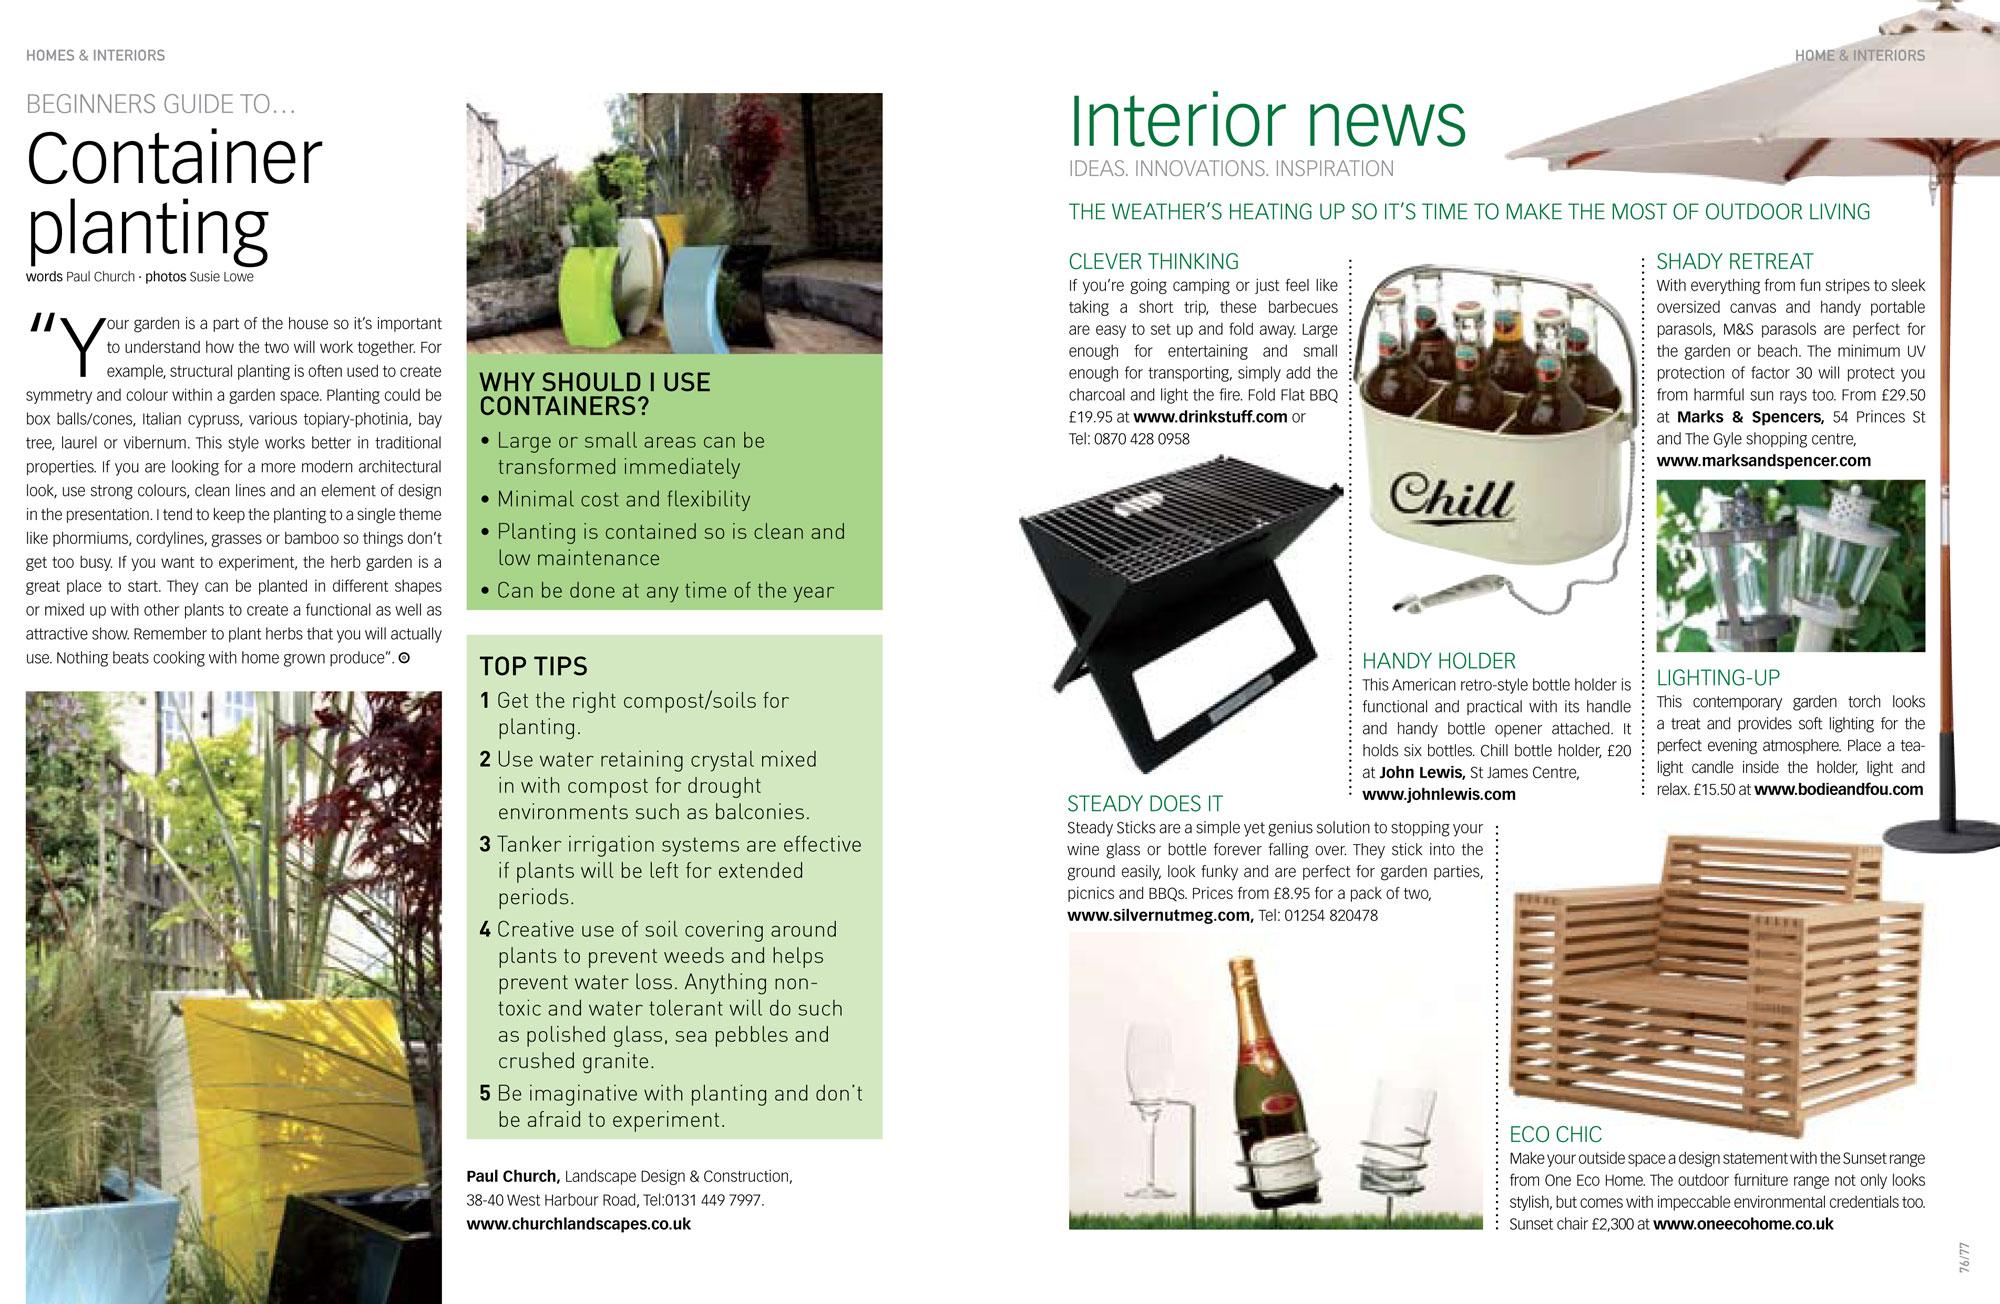 I-ON magazine EDINBURGH